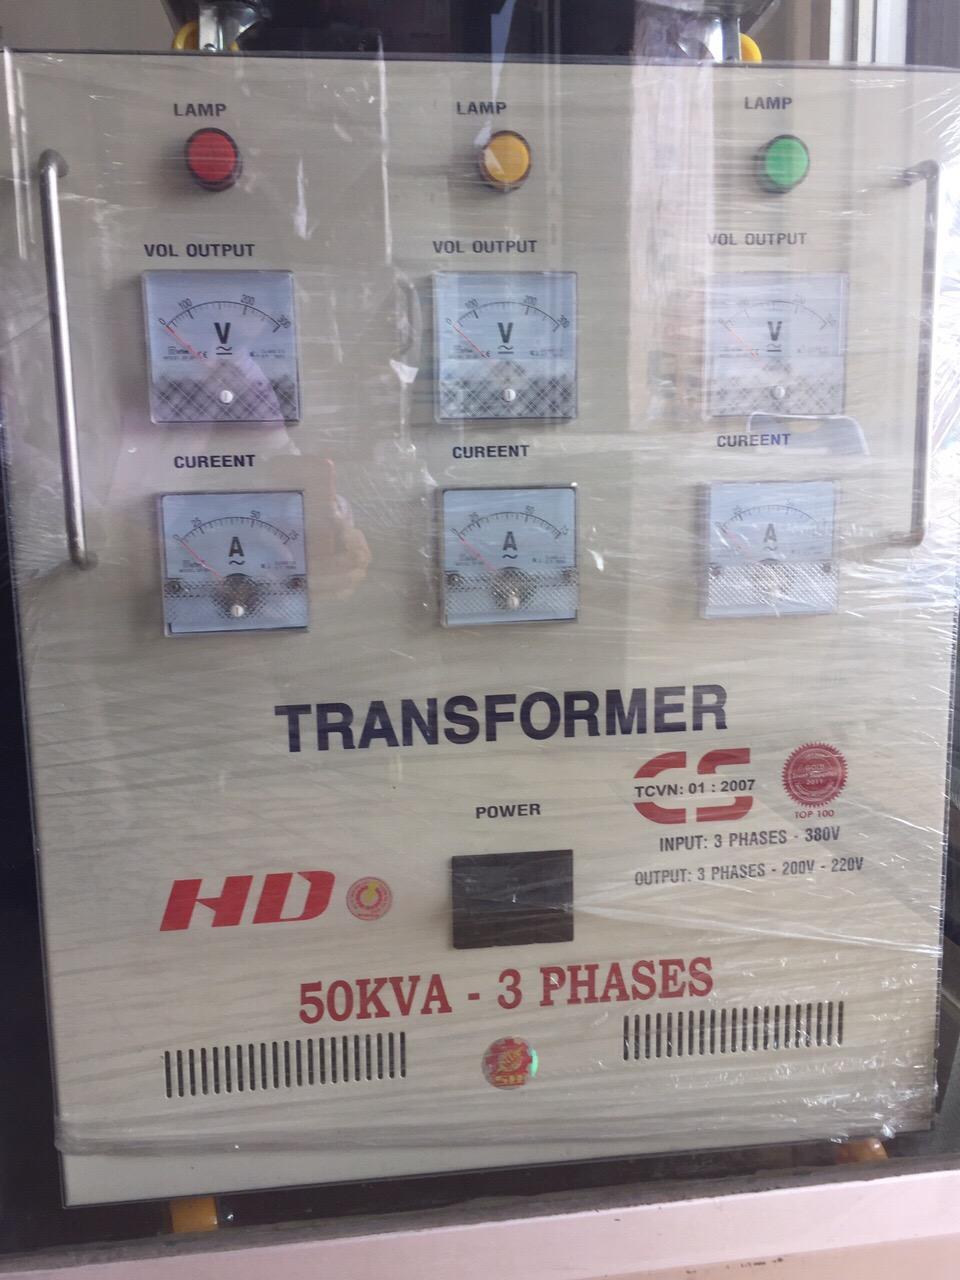 Máy Biến Thế 50KVA Hiệu HD